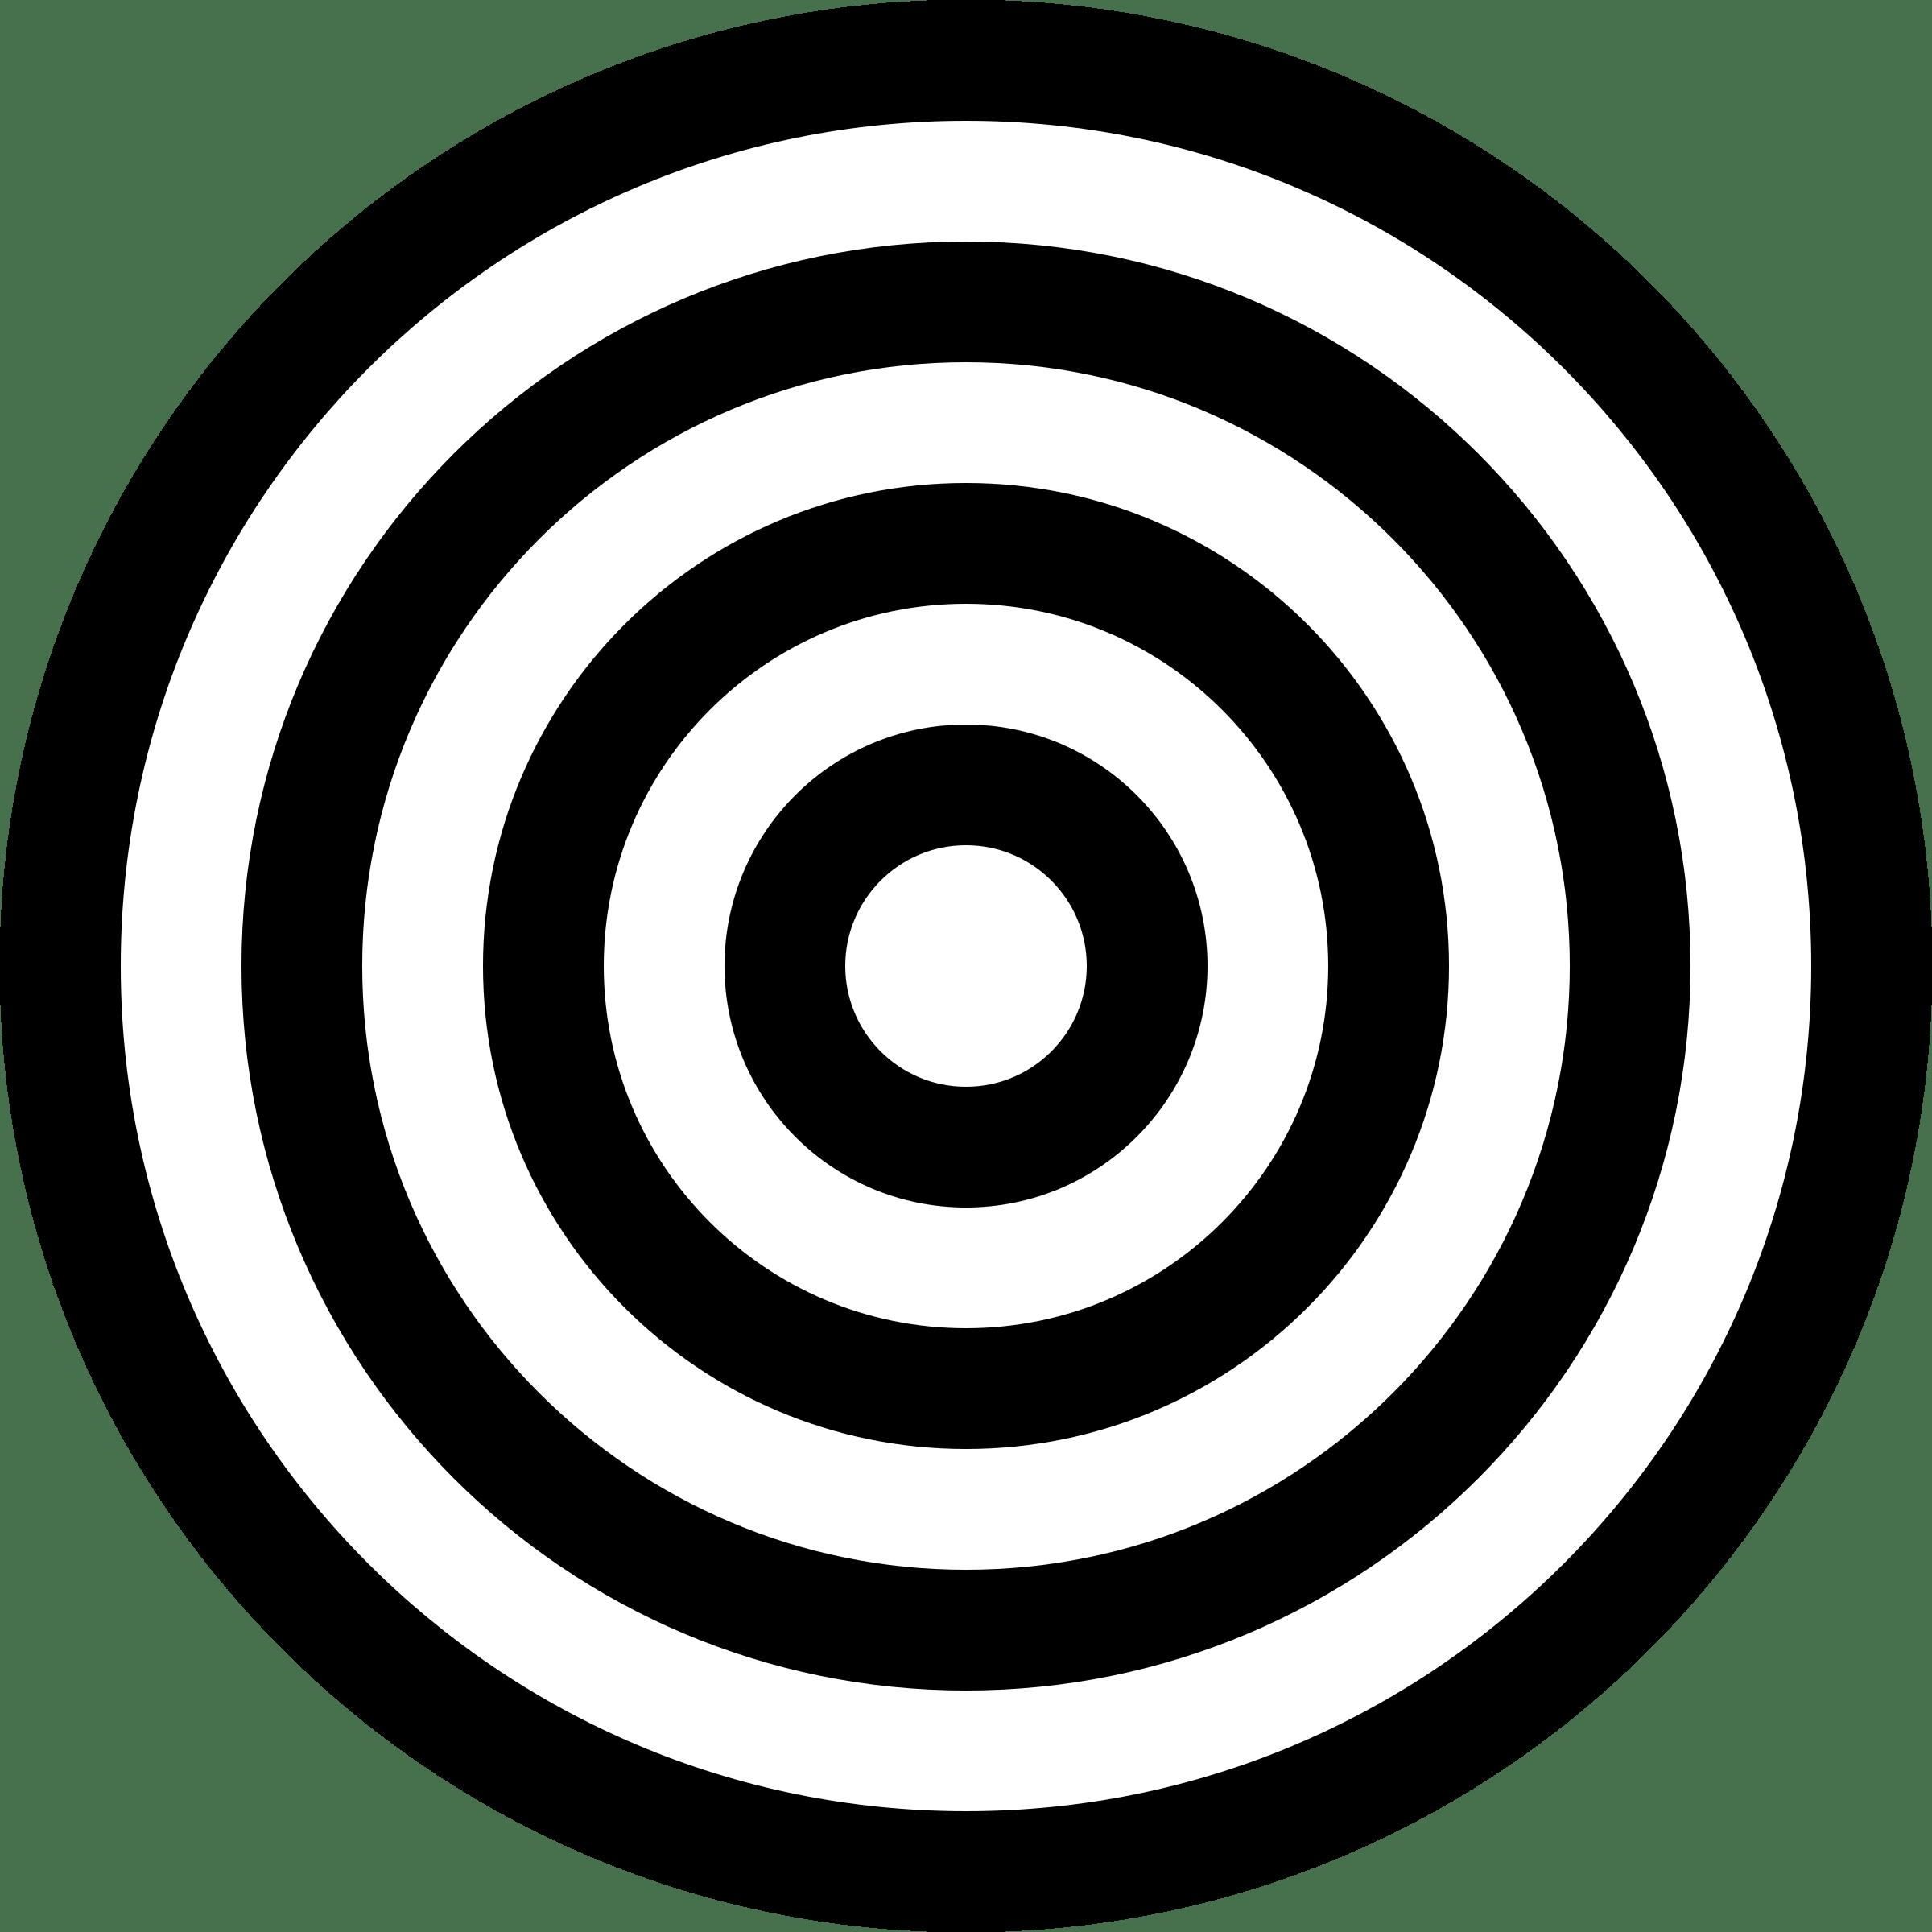 Target PNG - 2799